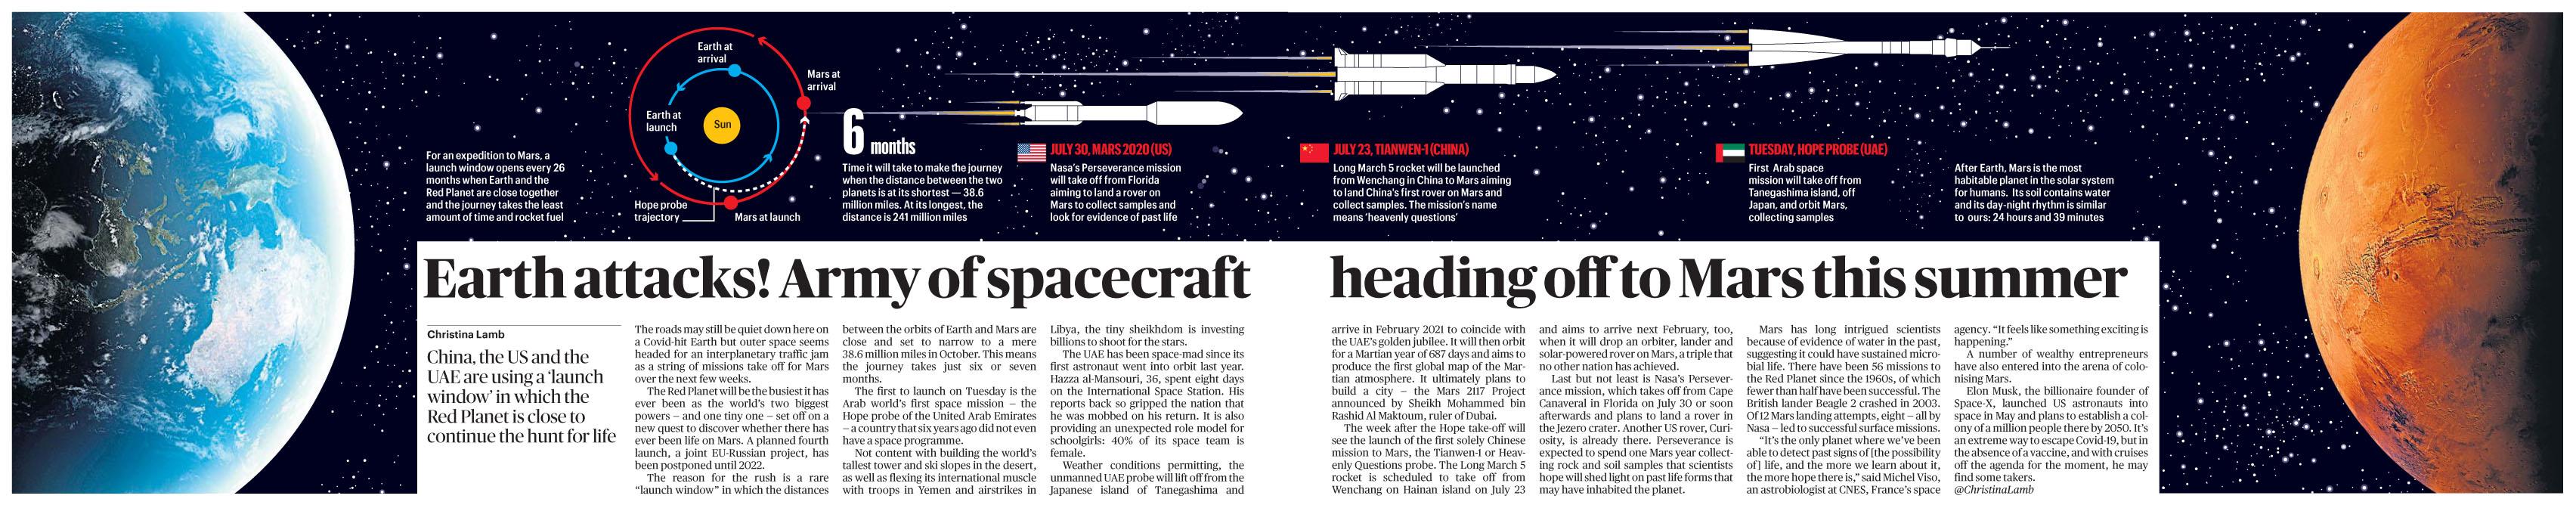 The Sunday Times - July 12 2020 Mars.jpg